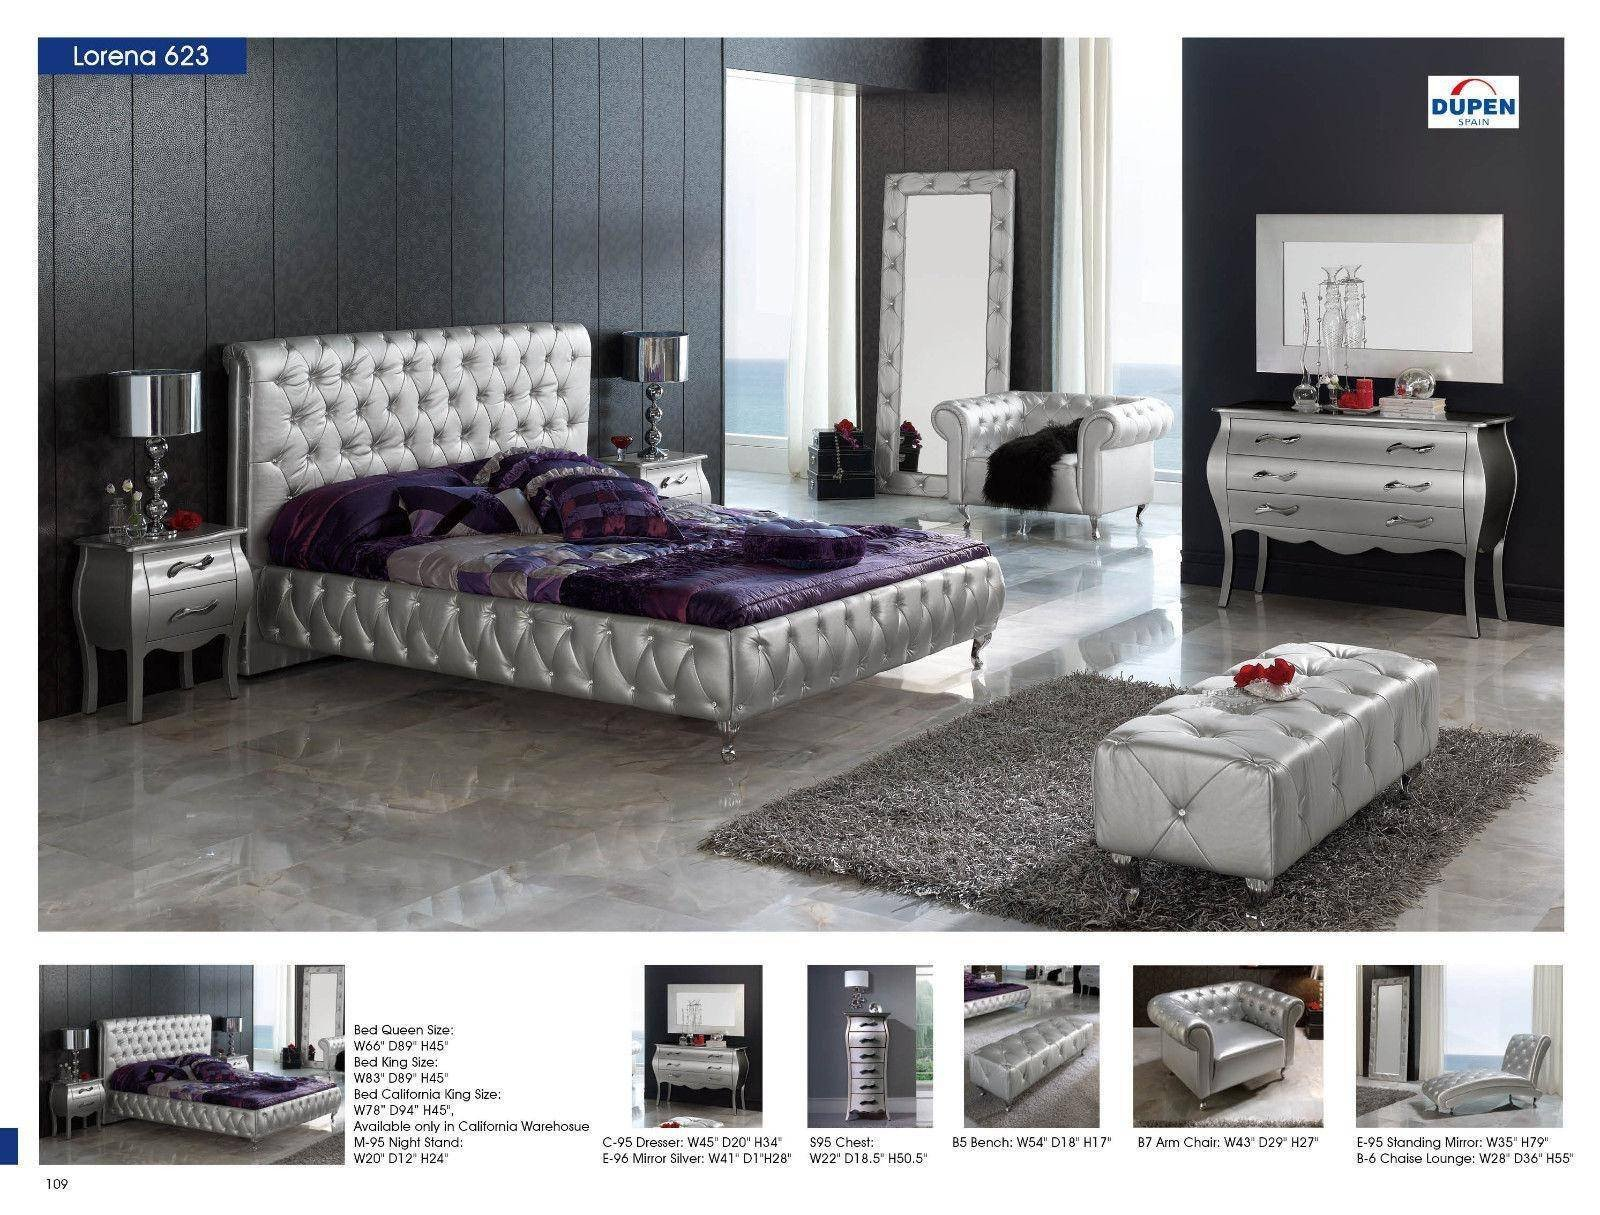 Silver Grey Bedroom Furniture Fresh Esf 623 Lorena Silver button Tufted Queen Bedroom Set 3